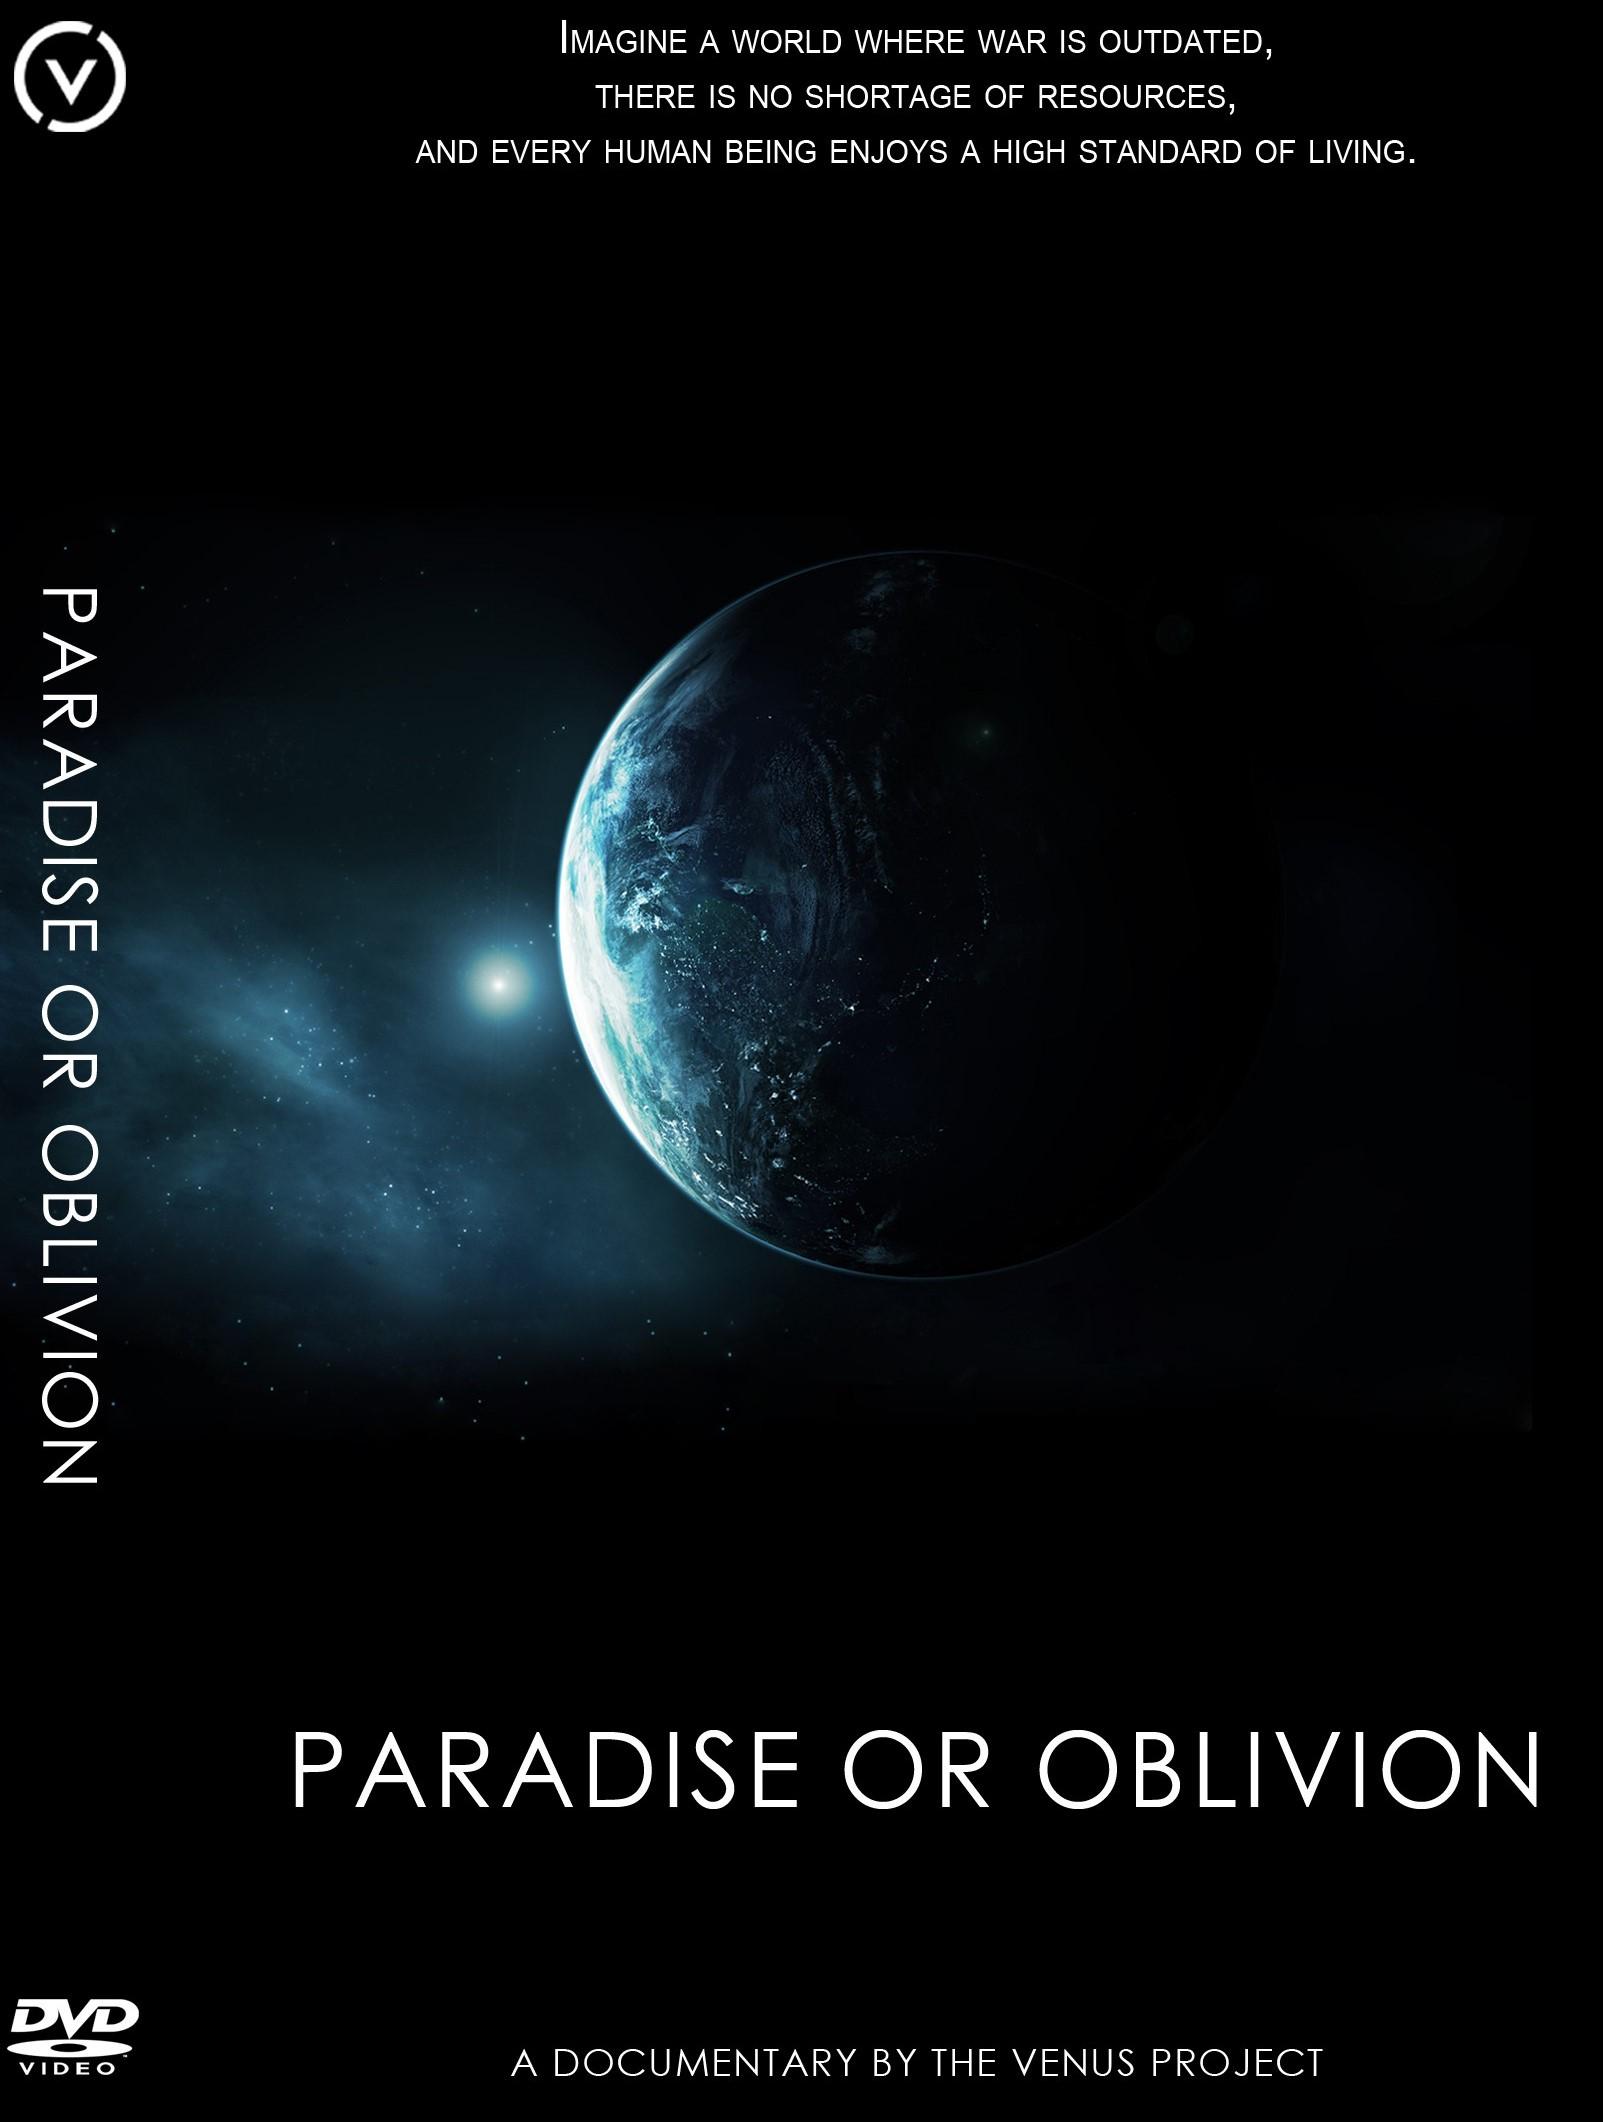 Paradise or Oblivion Full Documentary